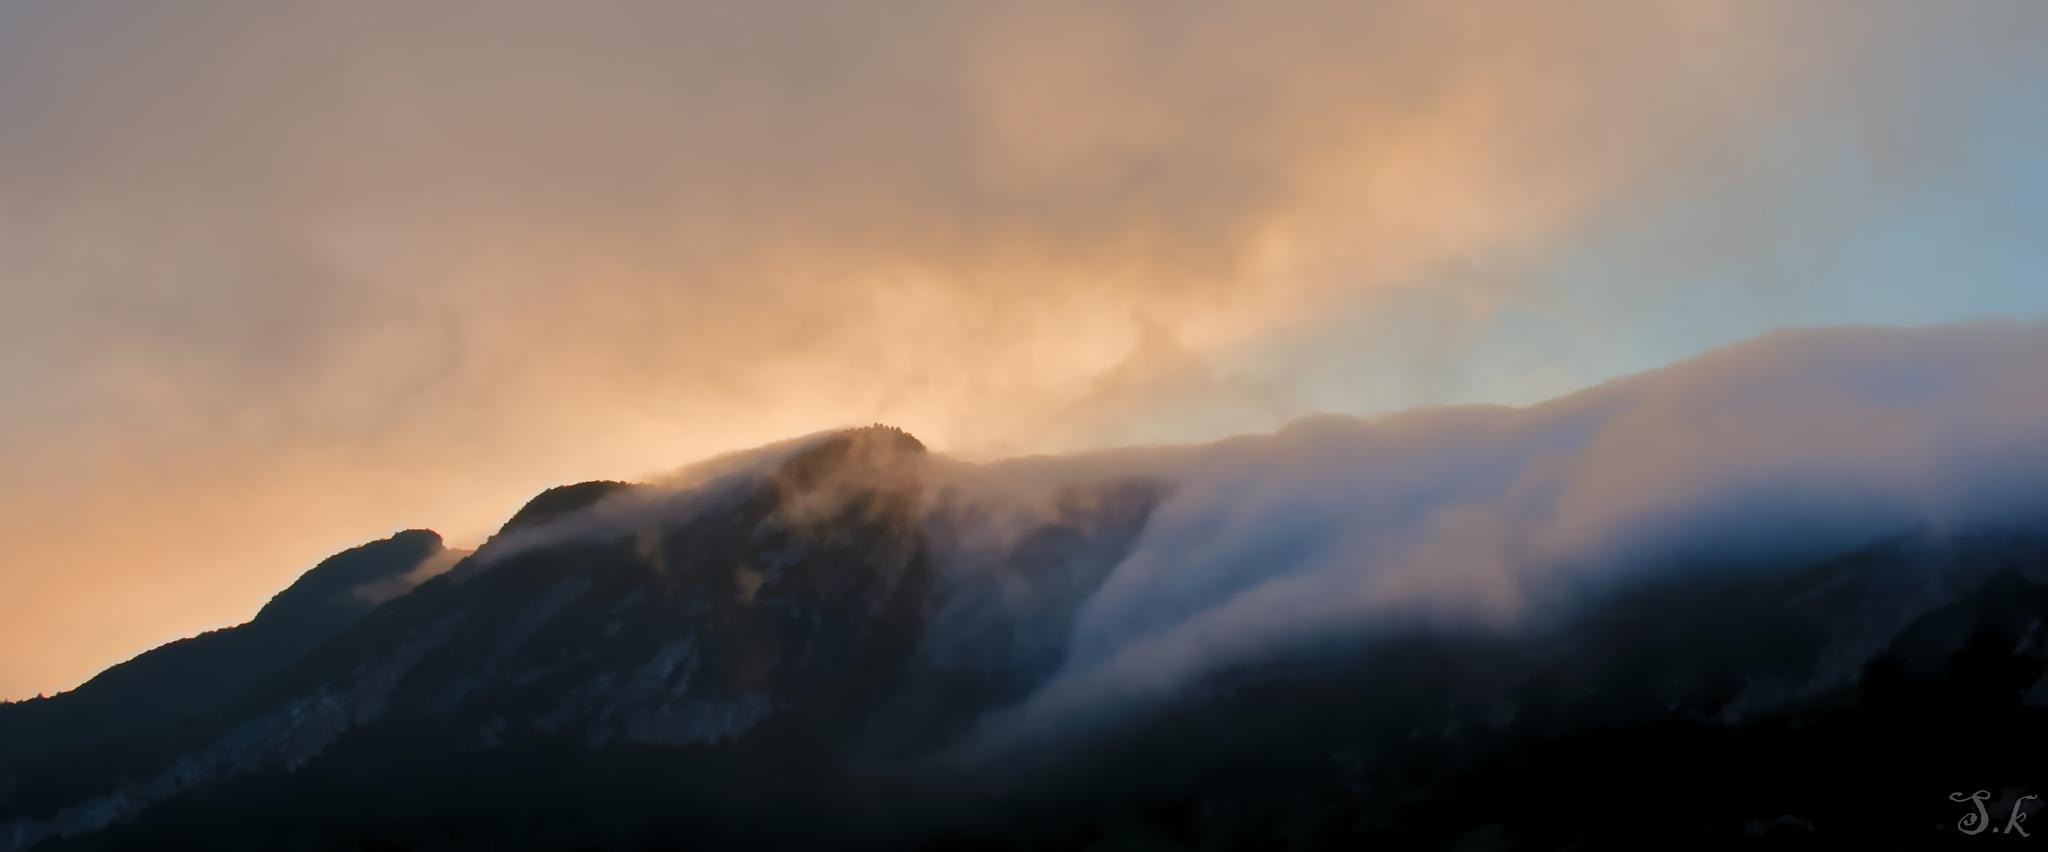 A fog journey by Sanaa Kerroumi